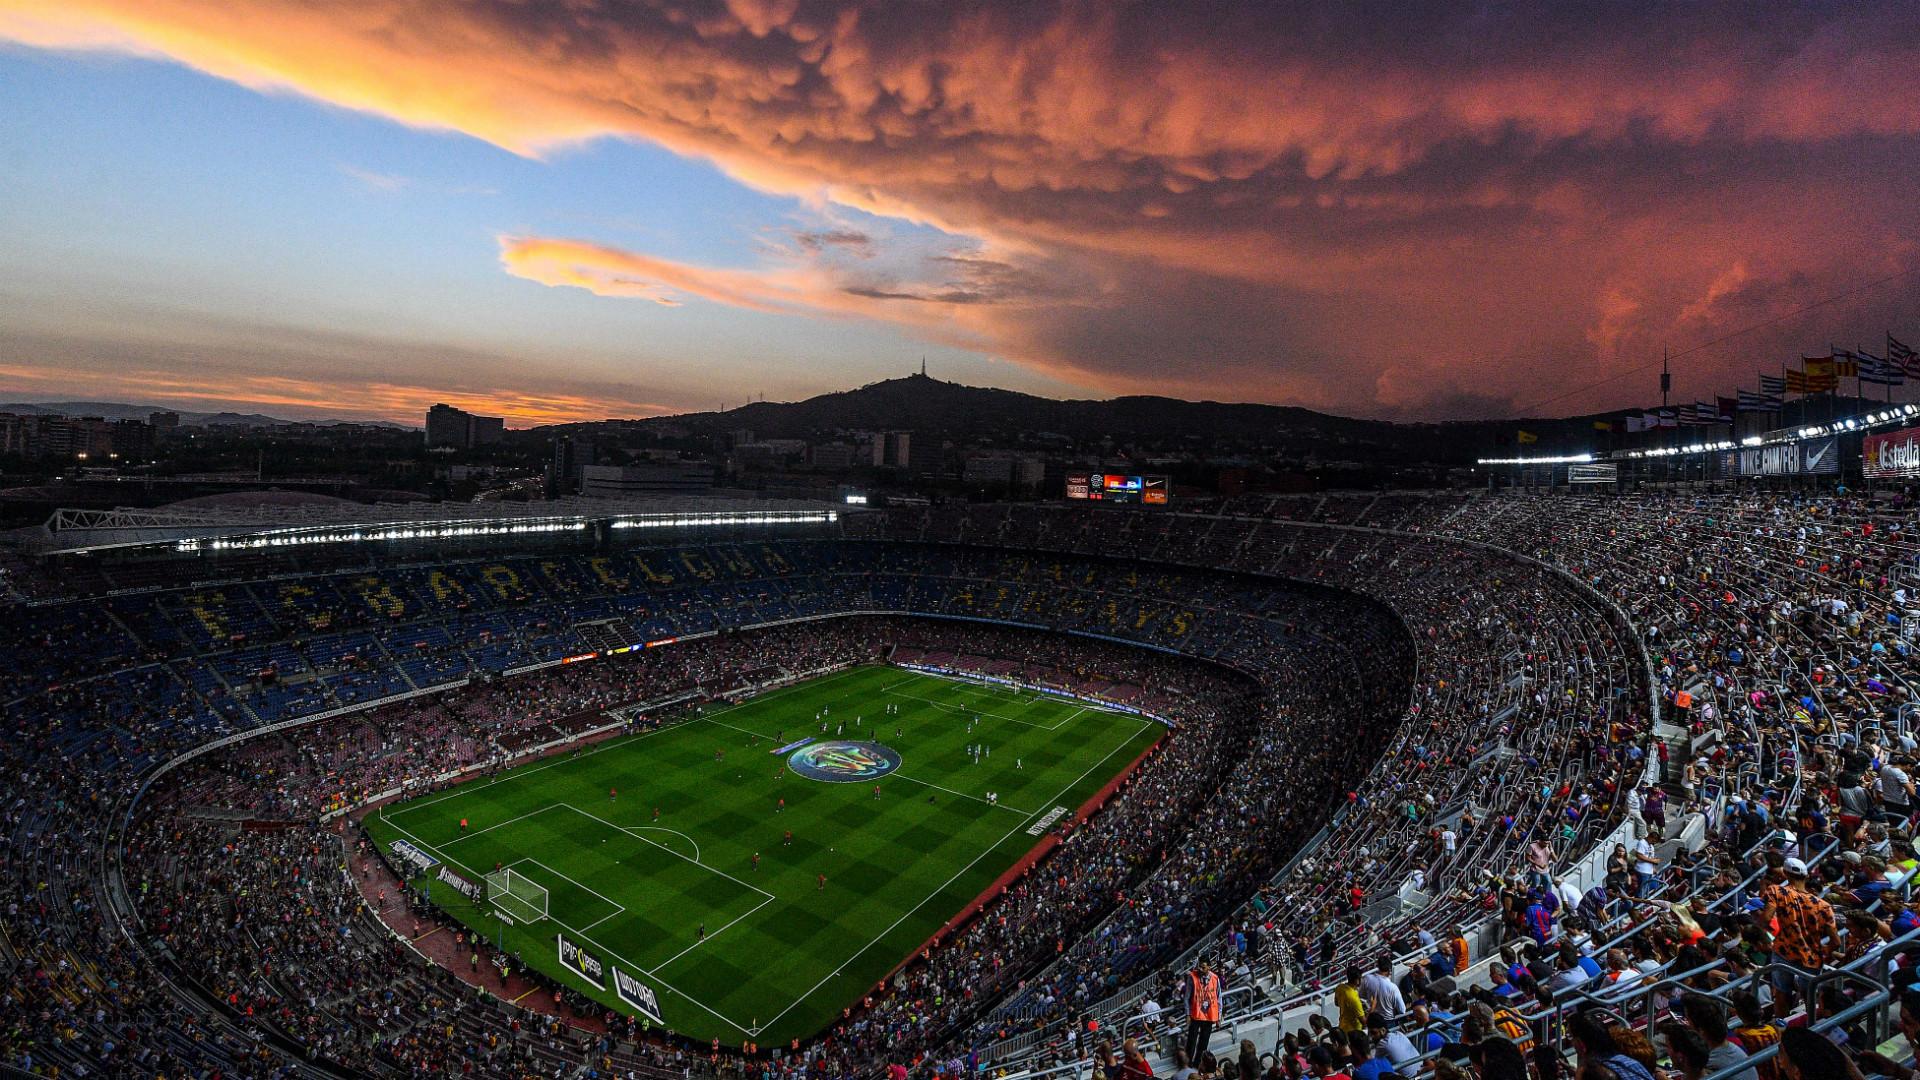 HD Camp Nou